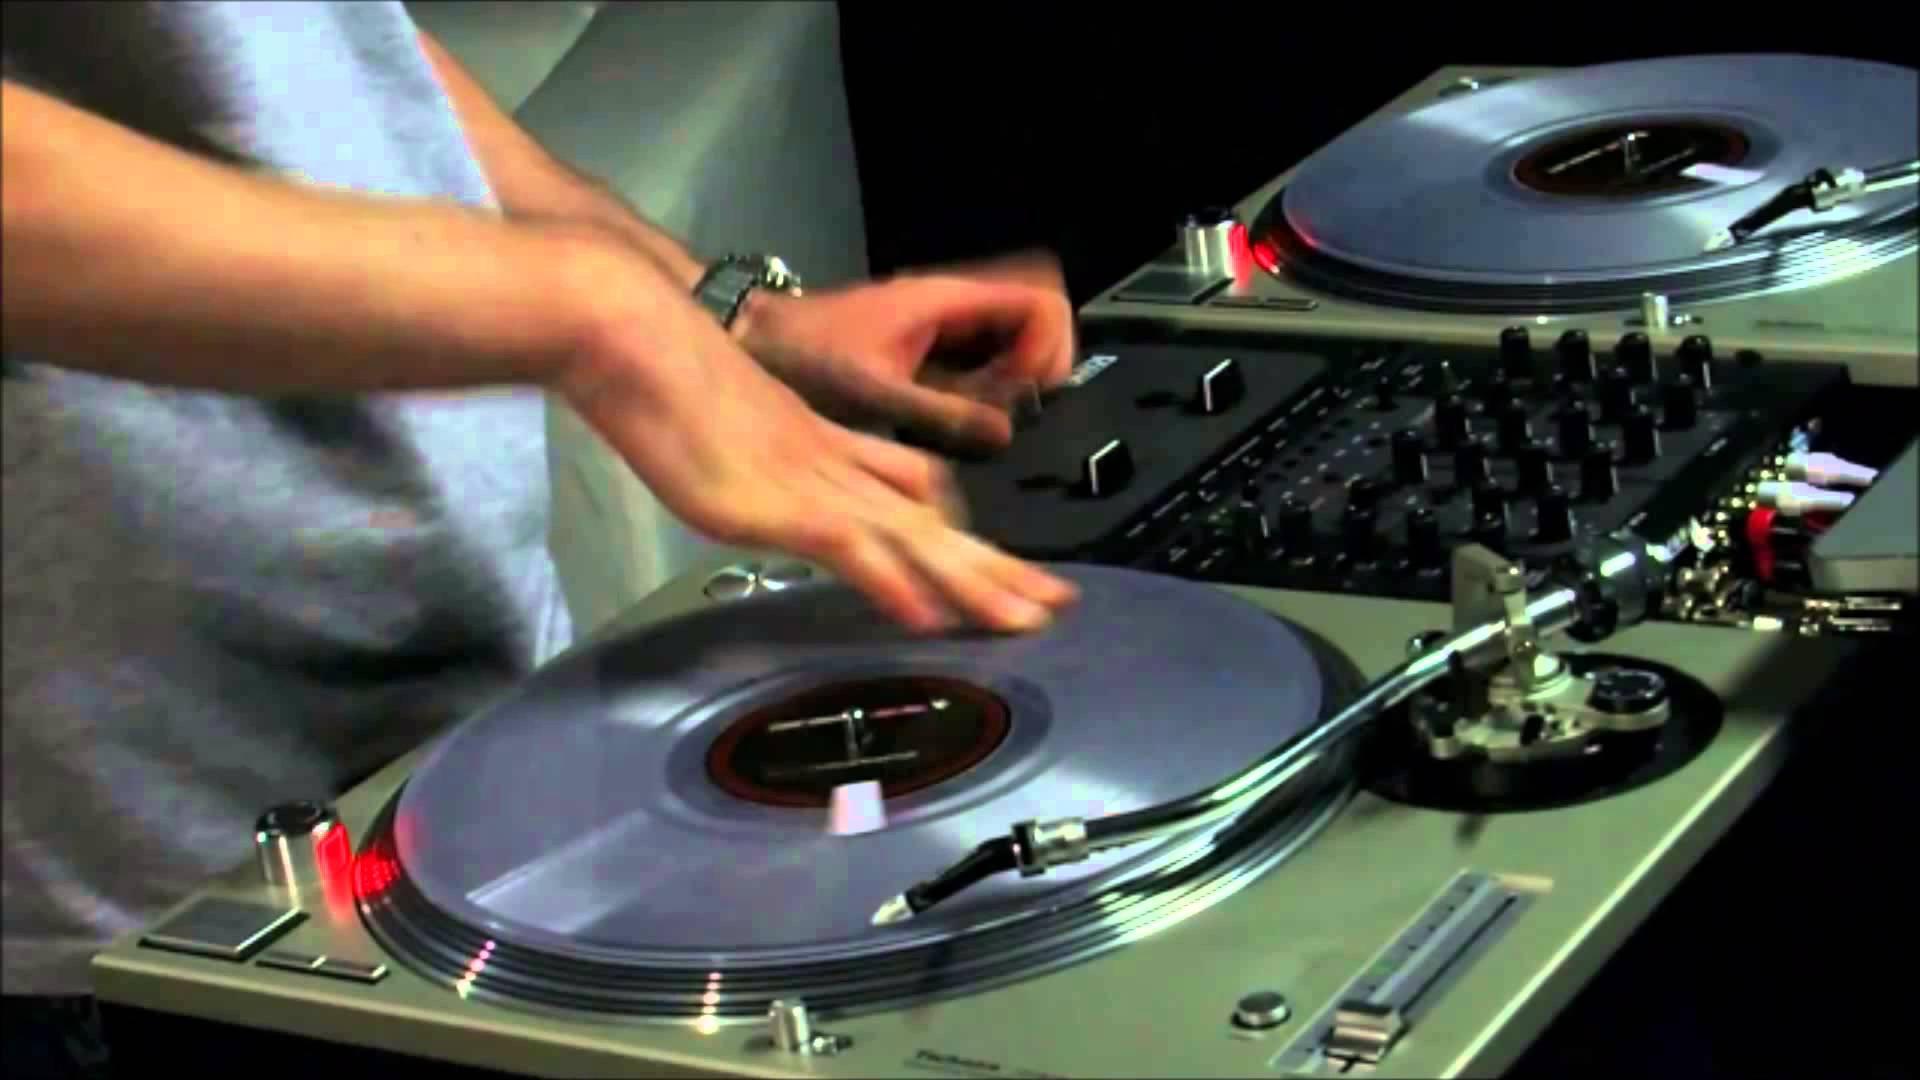 Broken Record Sound Effect free download